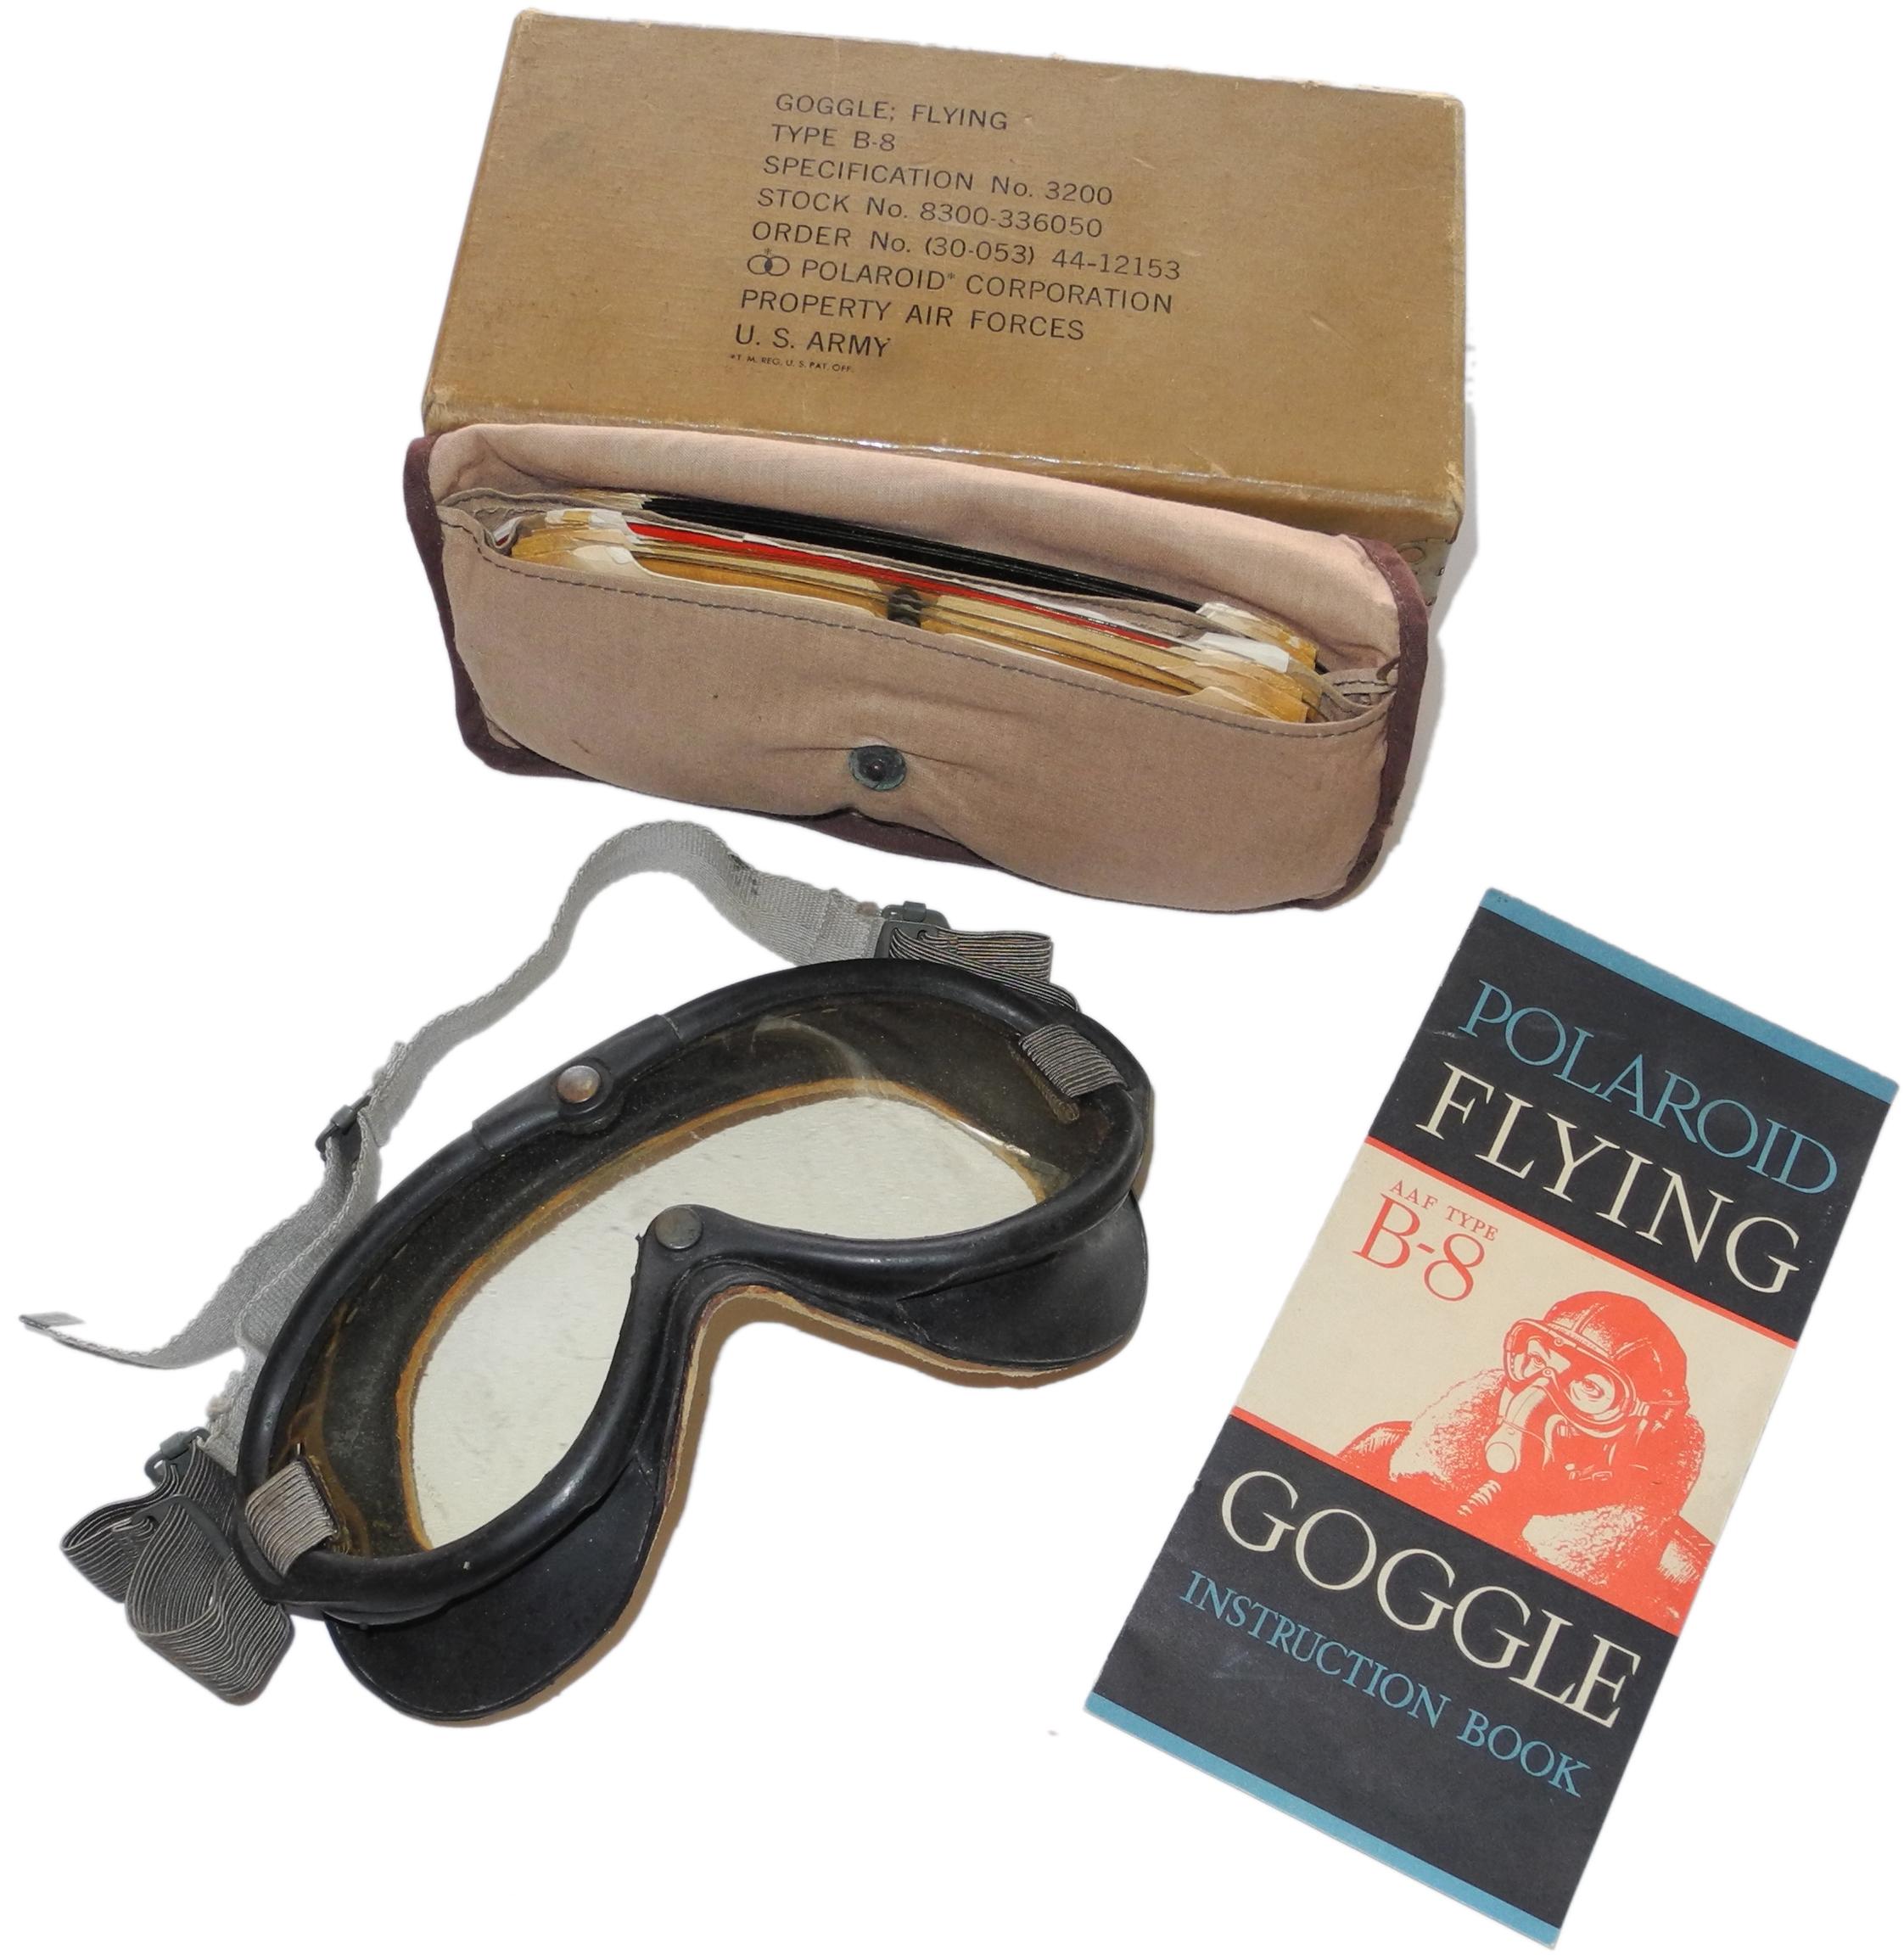 AAF B-8 goggles boxed